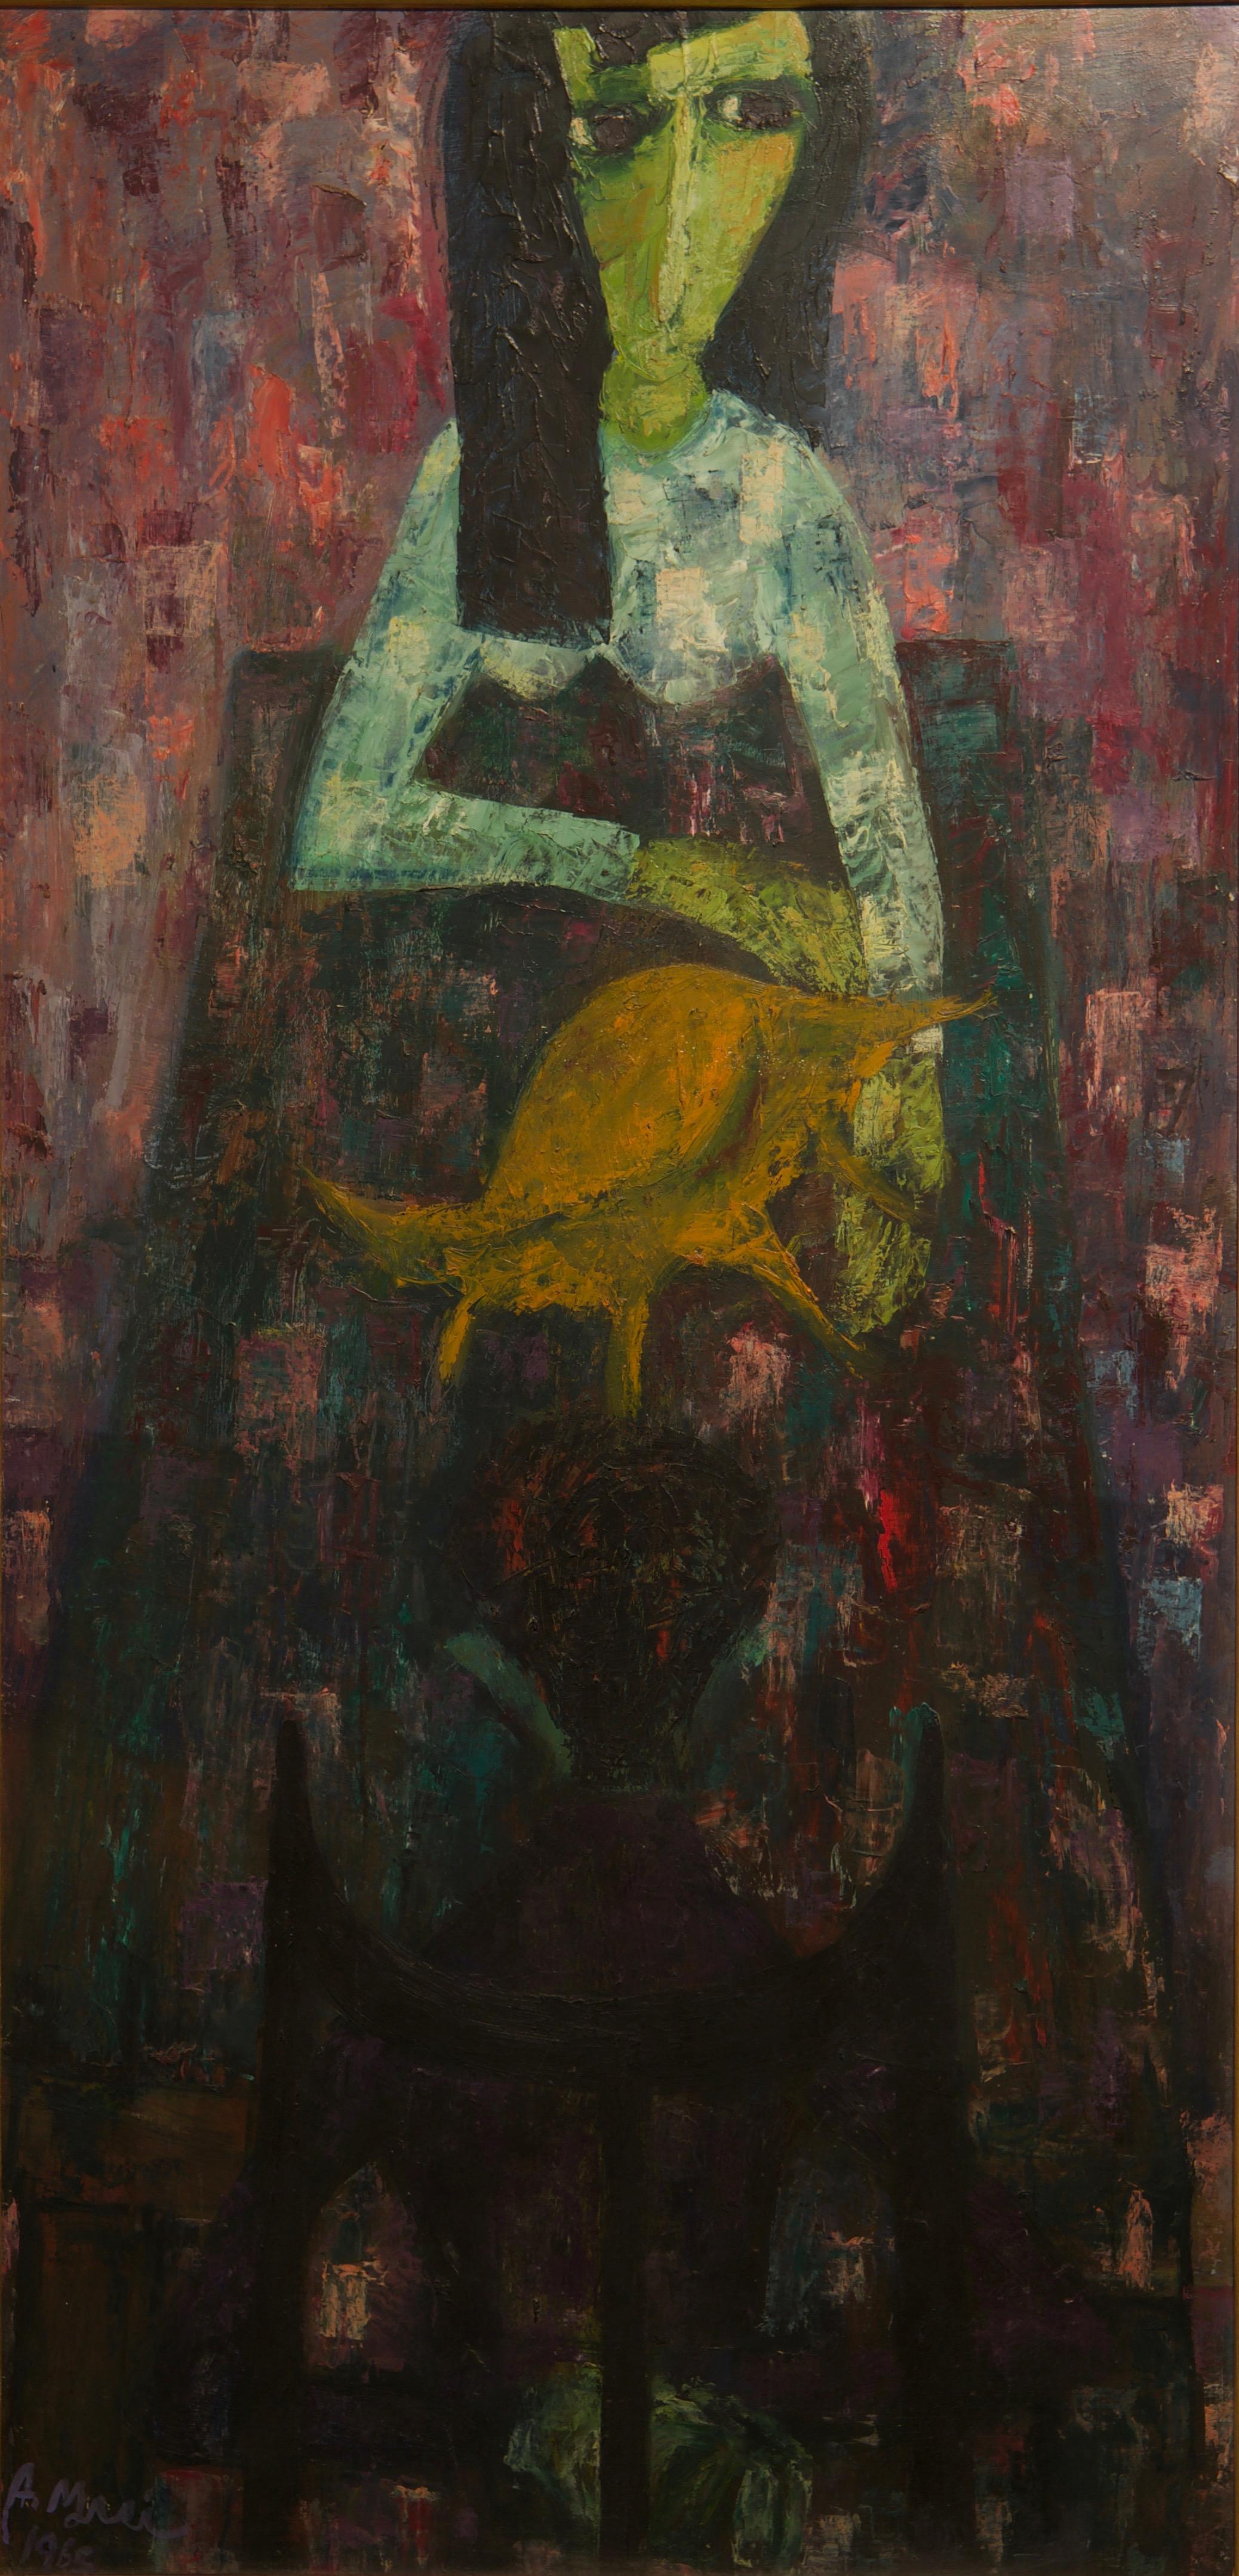 Ahmed-Morsi-Untitled-1965.jpg